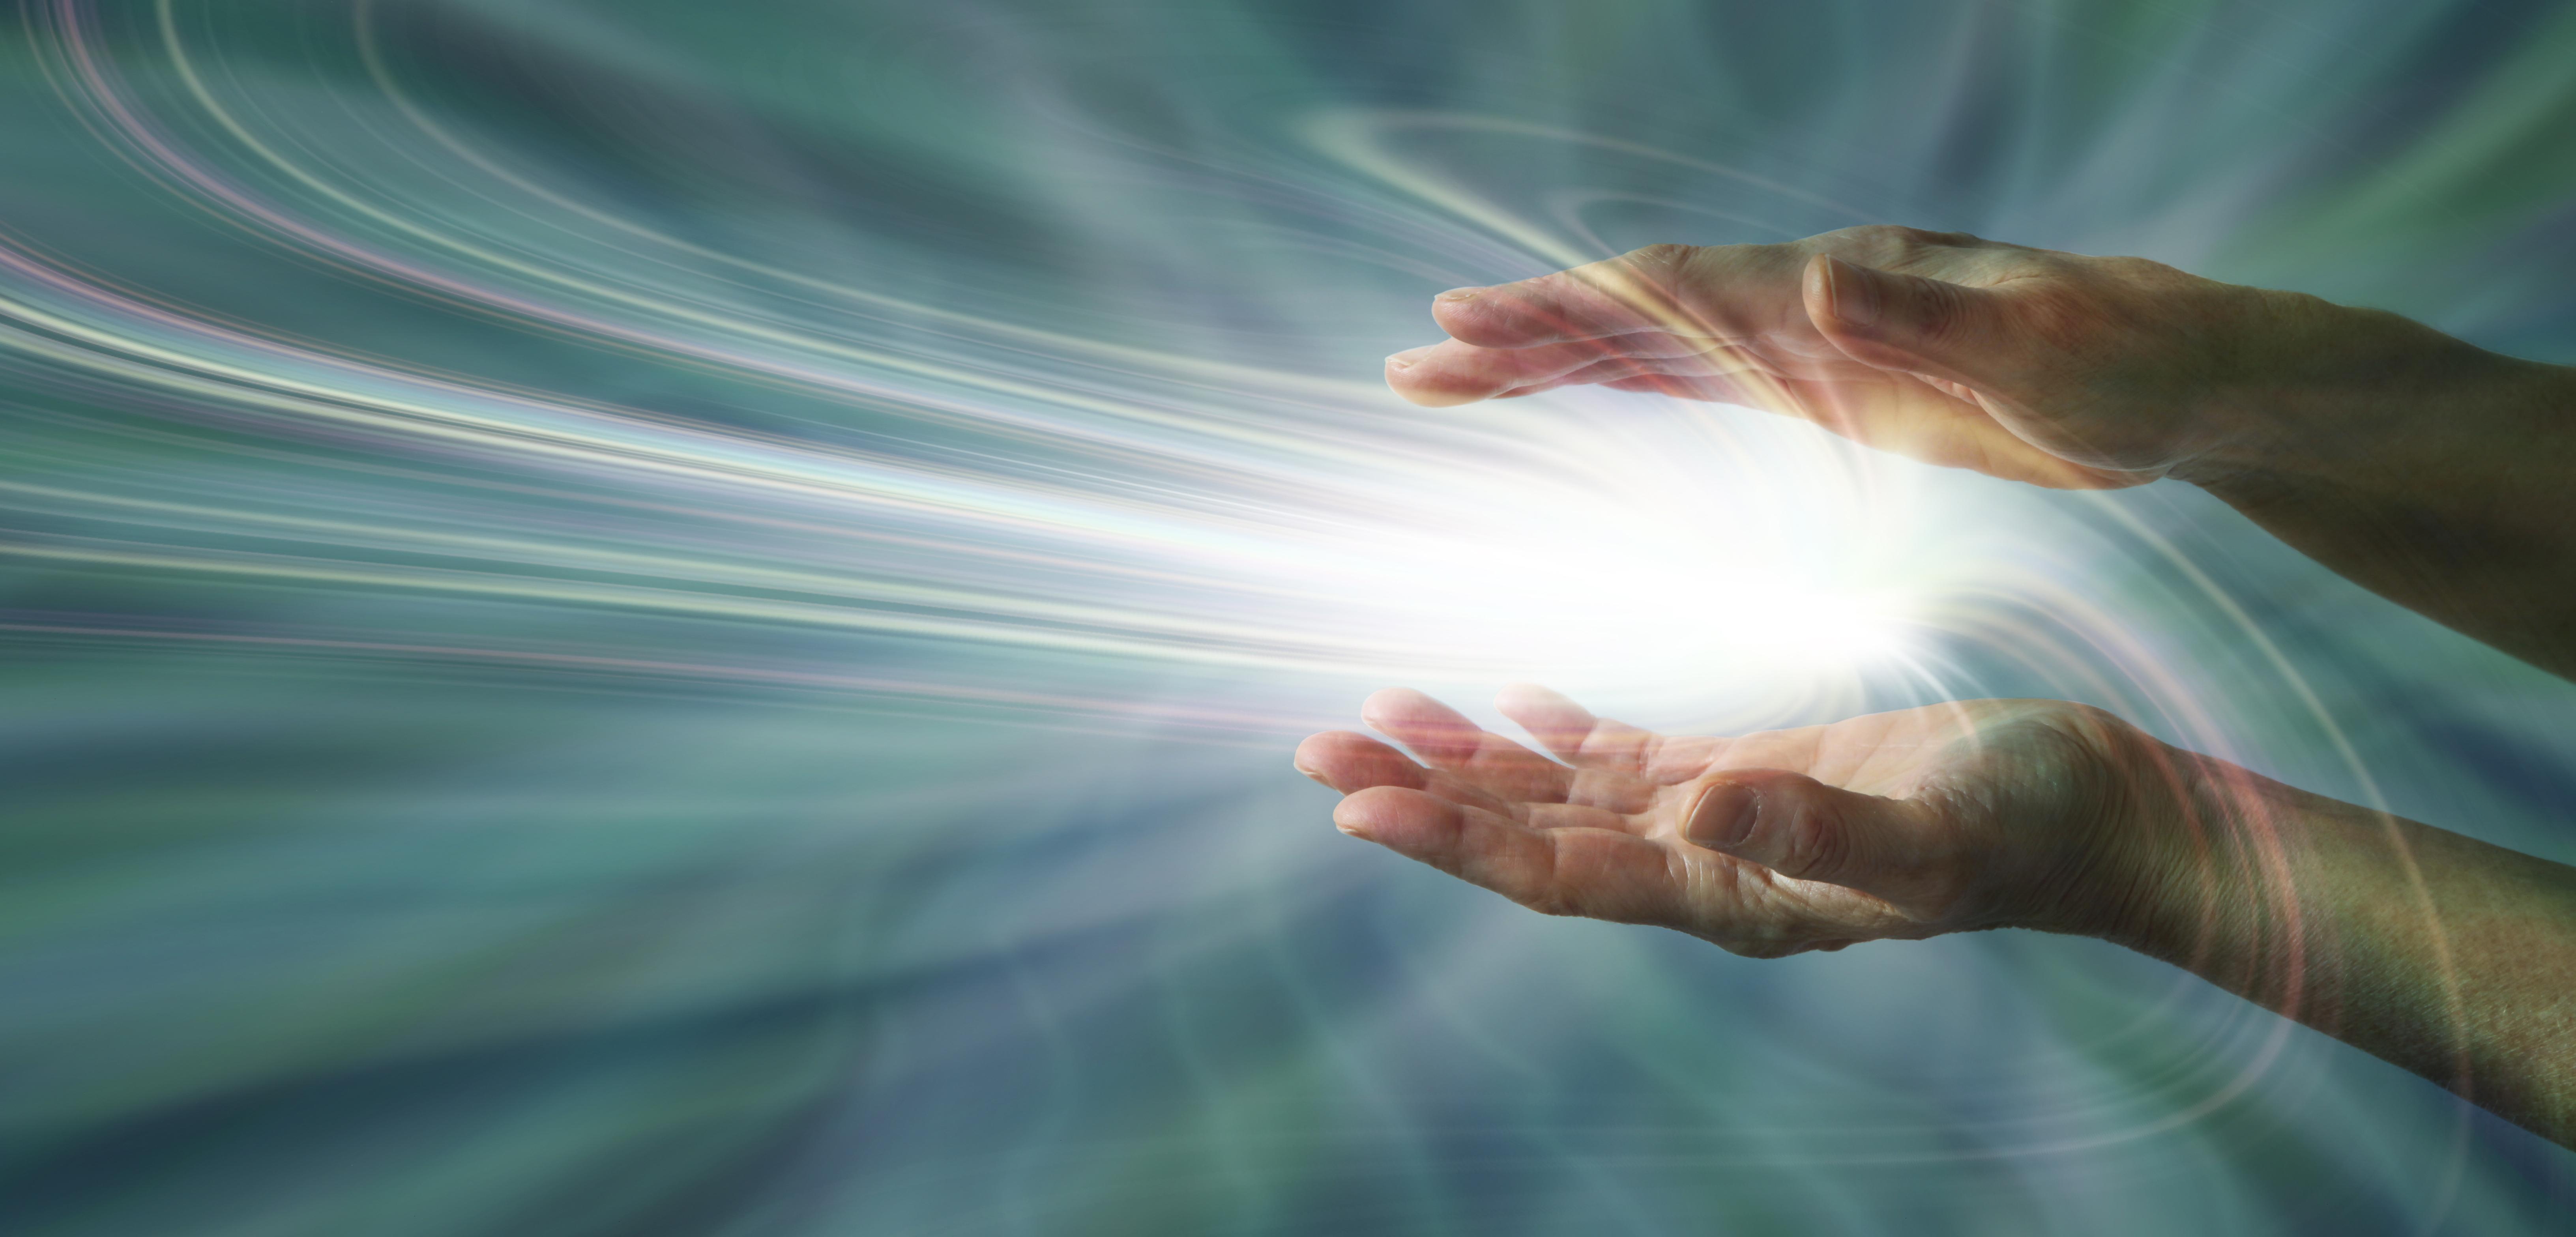 Spirituelles Heilen durch Handauflegen